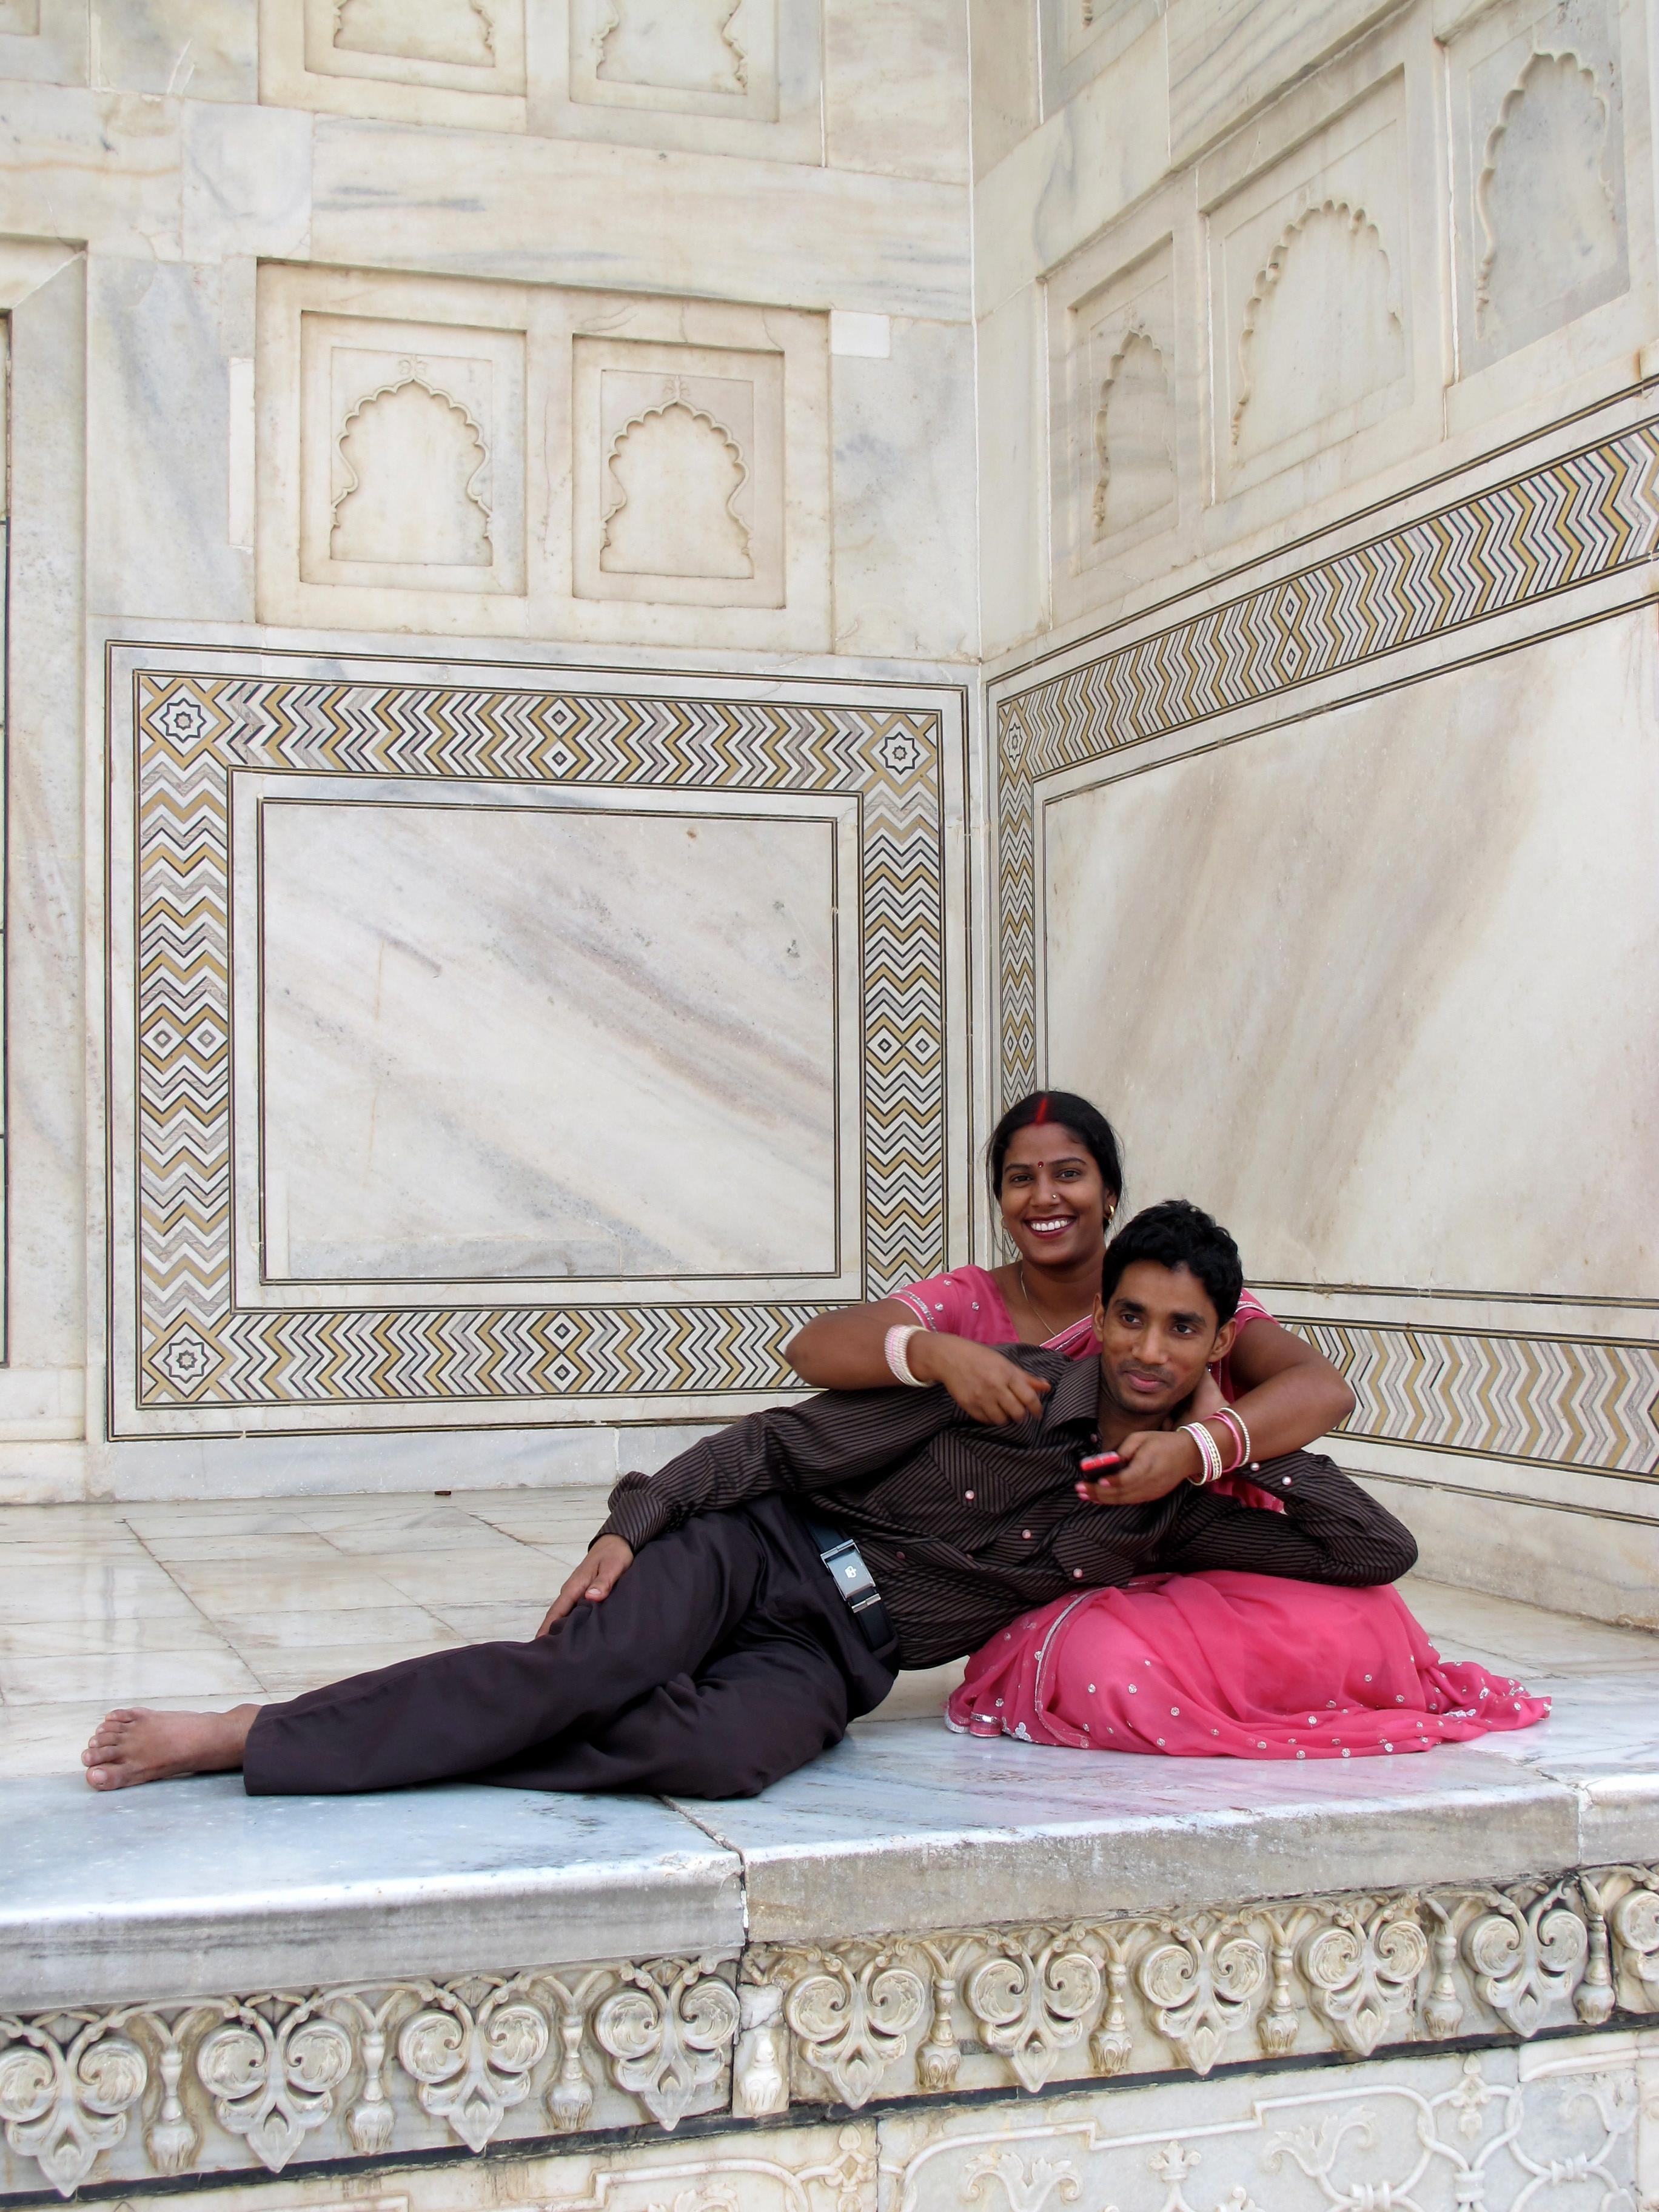 Young couple - Taj Mahal - Agra - India